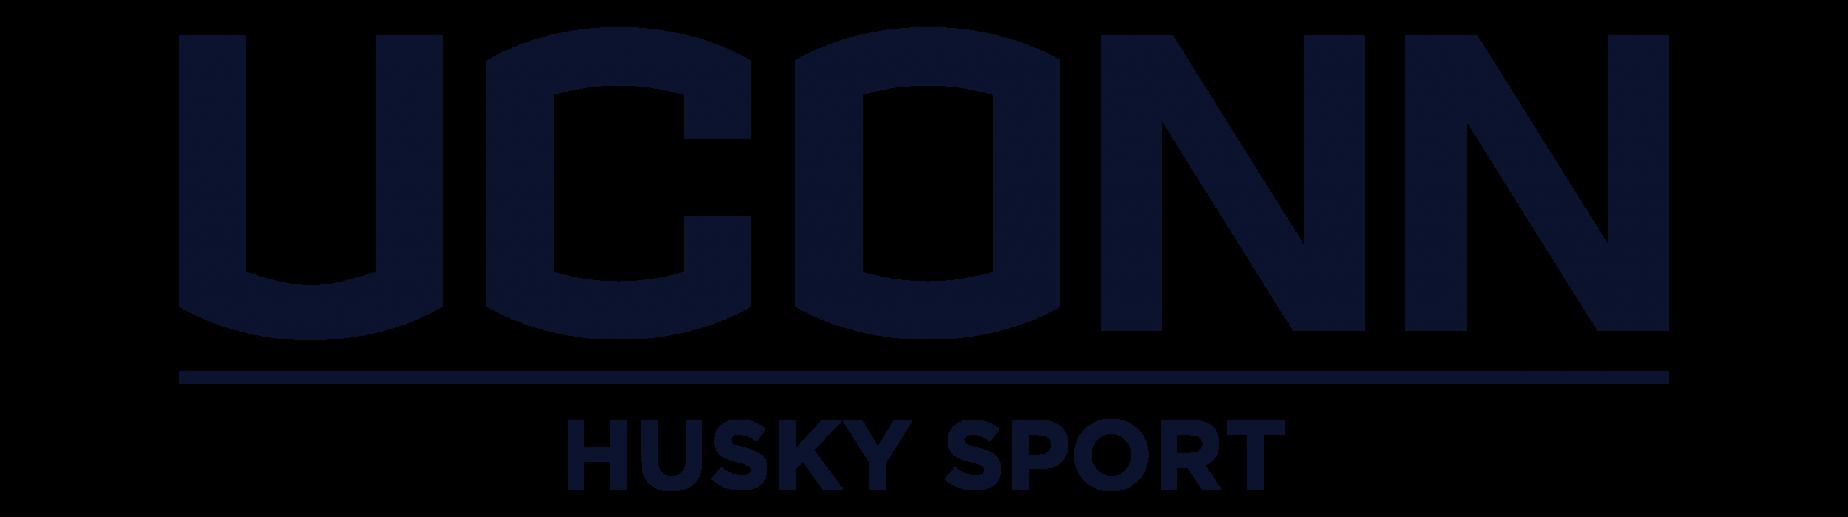 Homepage sport . Husky clipart connecticut university